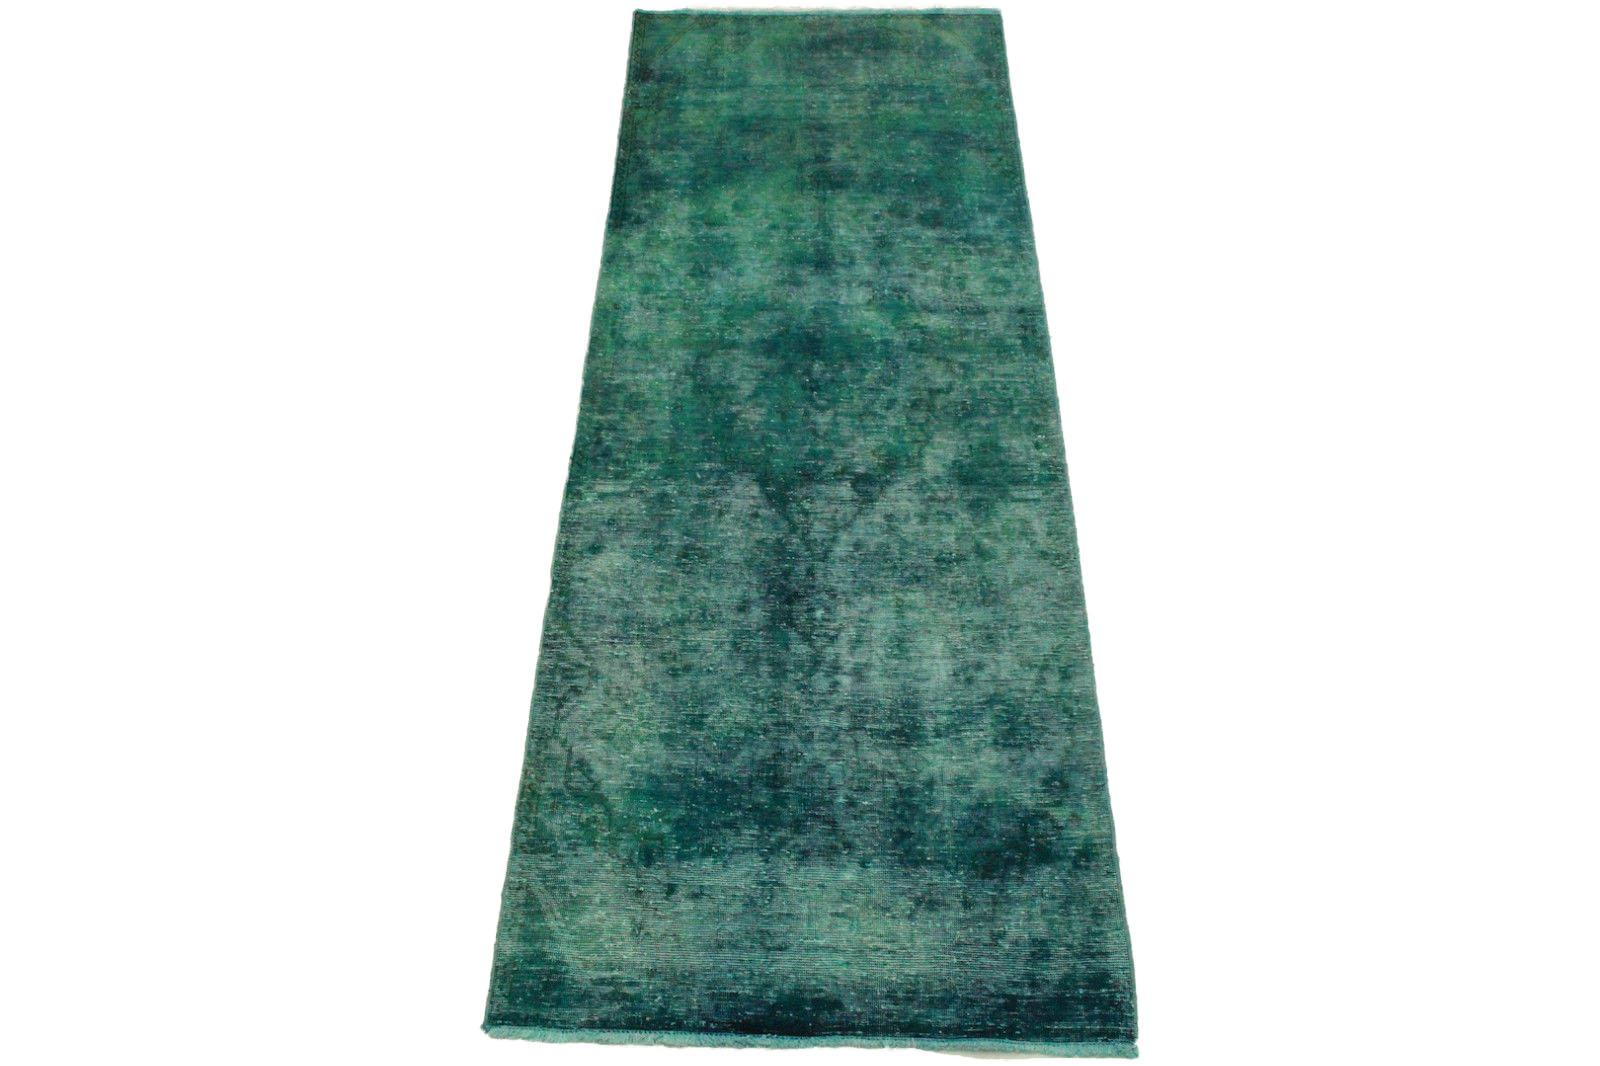 vintage teppich blau in 310x110cm 1001 3269 bei. Black Bedroom Furniture Sets. Home Design Ideas